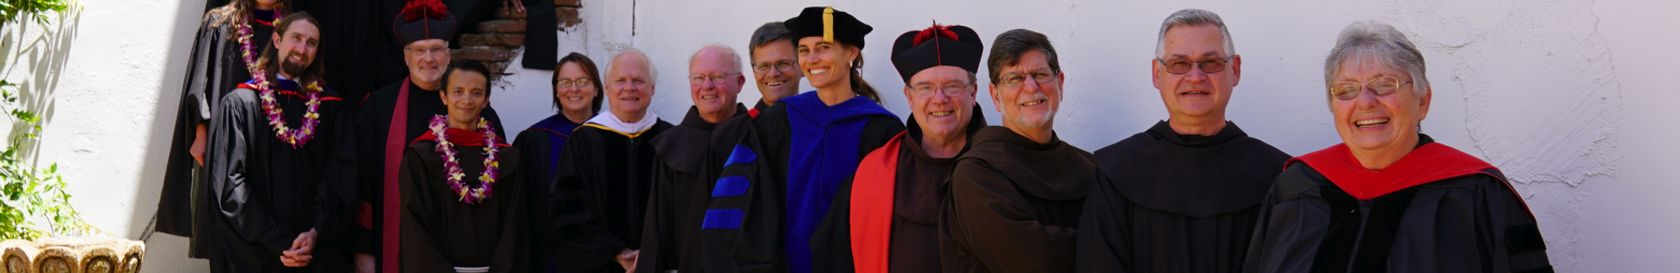 Franciscan School of Theology (FST)